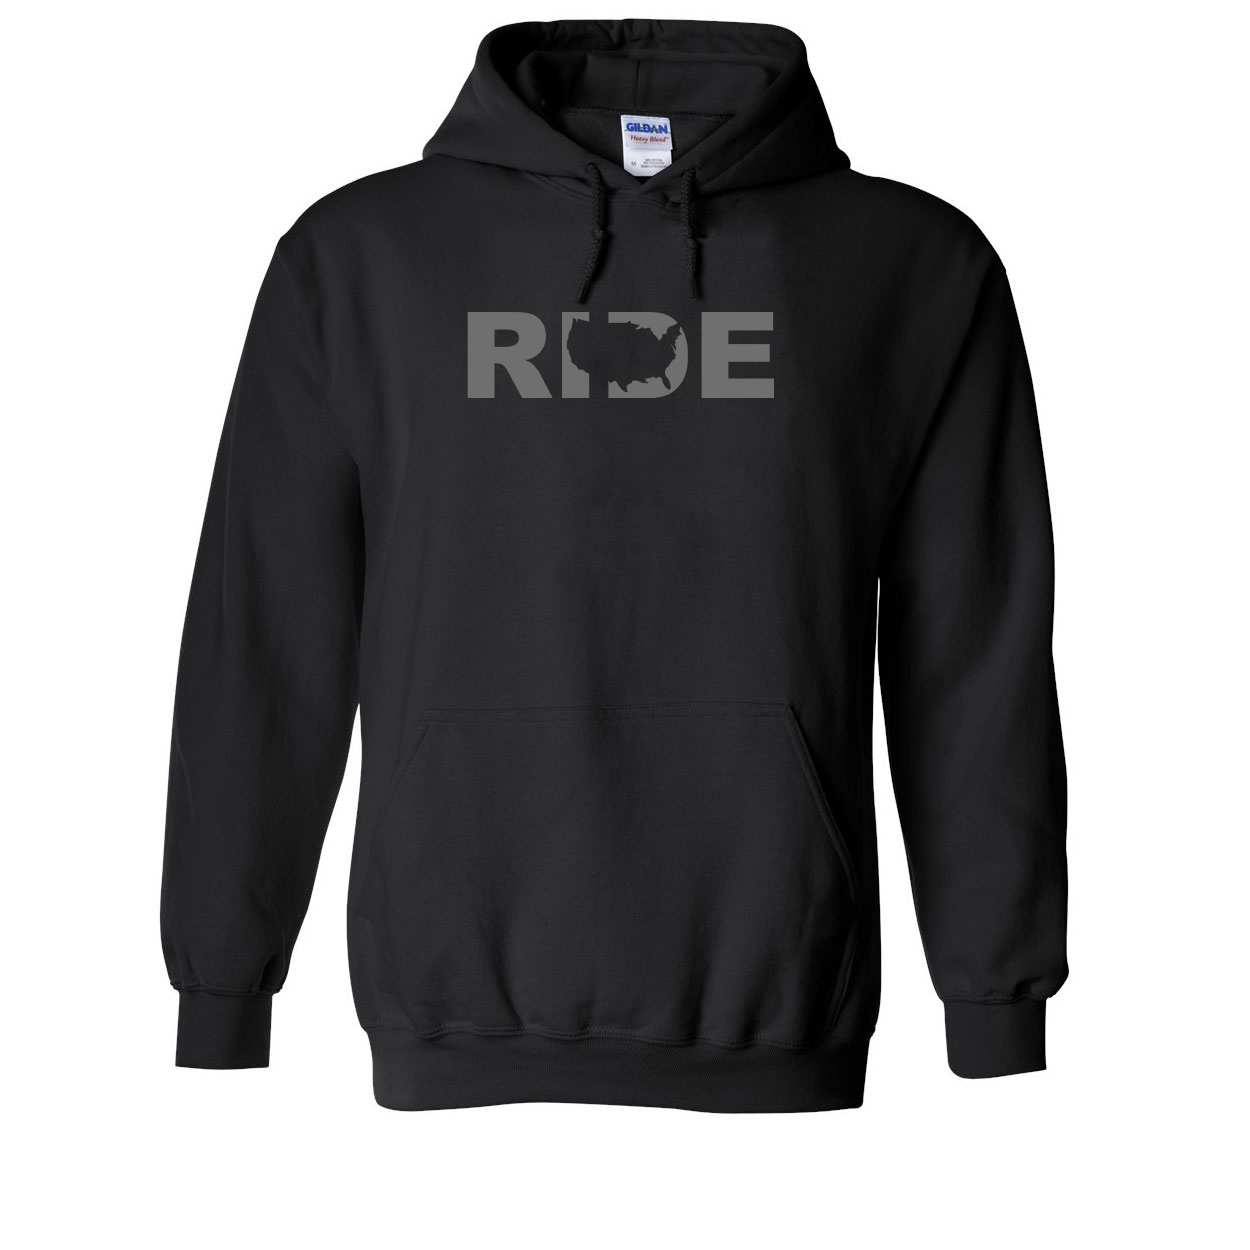 Ride United States Classic Sweatshirt Black (Gray Logo)